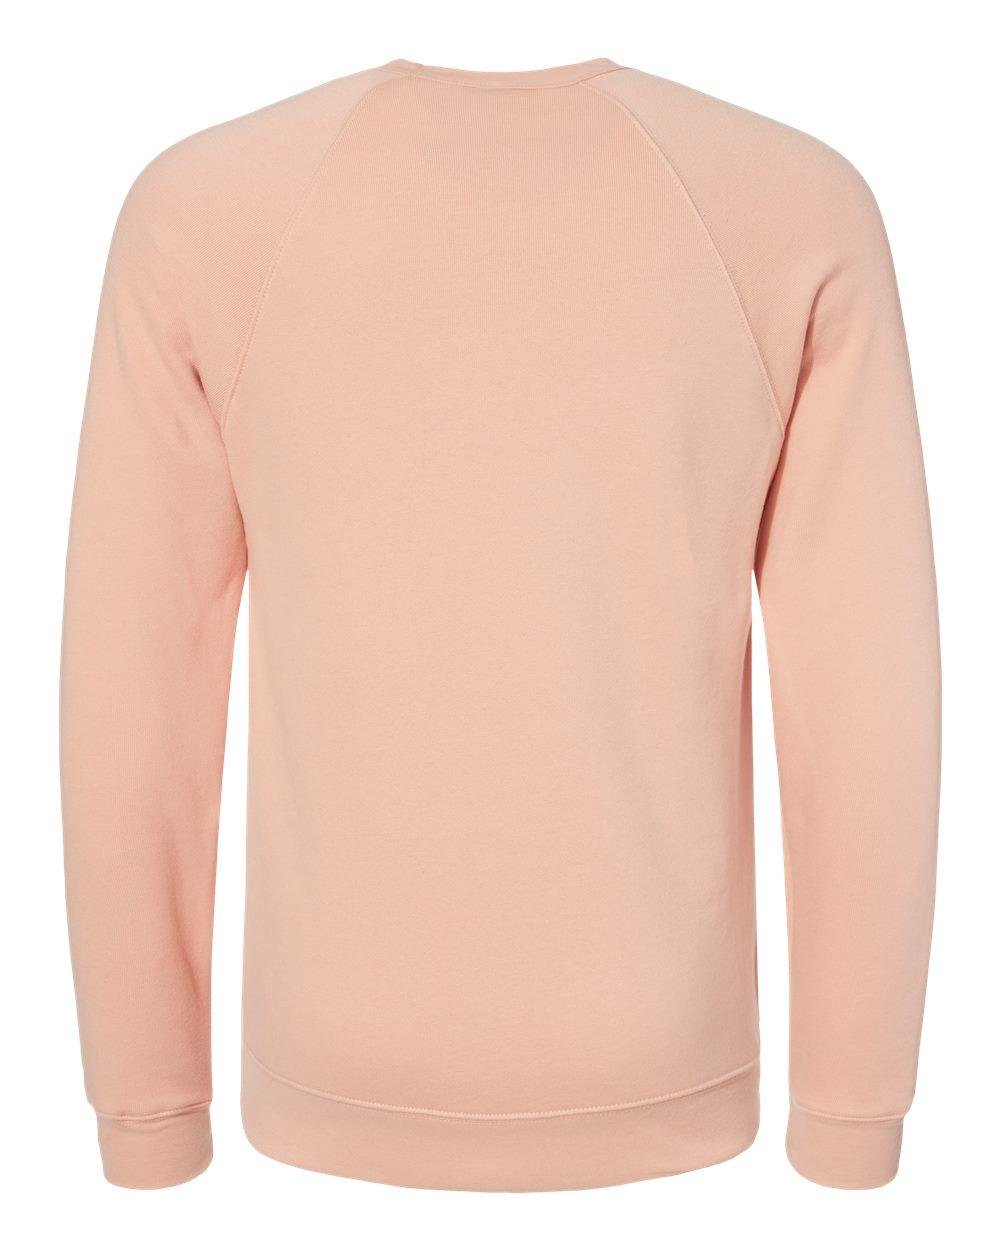 Bella-Canvas-Unisex-Sponge-Fleece-Crewneck-Sweatshirt-Top-Blank-3901-up-to-2XL thumbnail 58